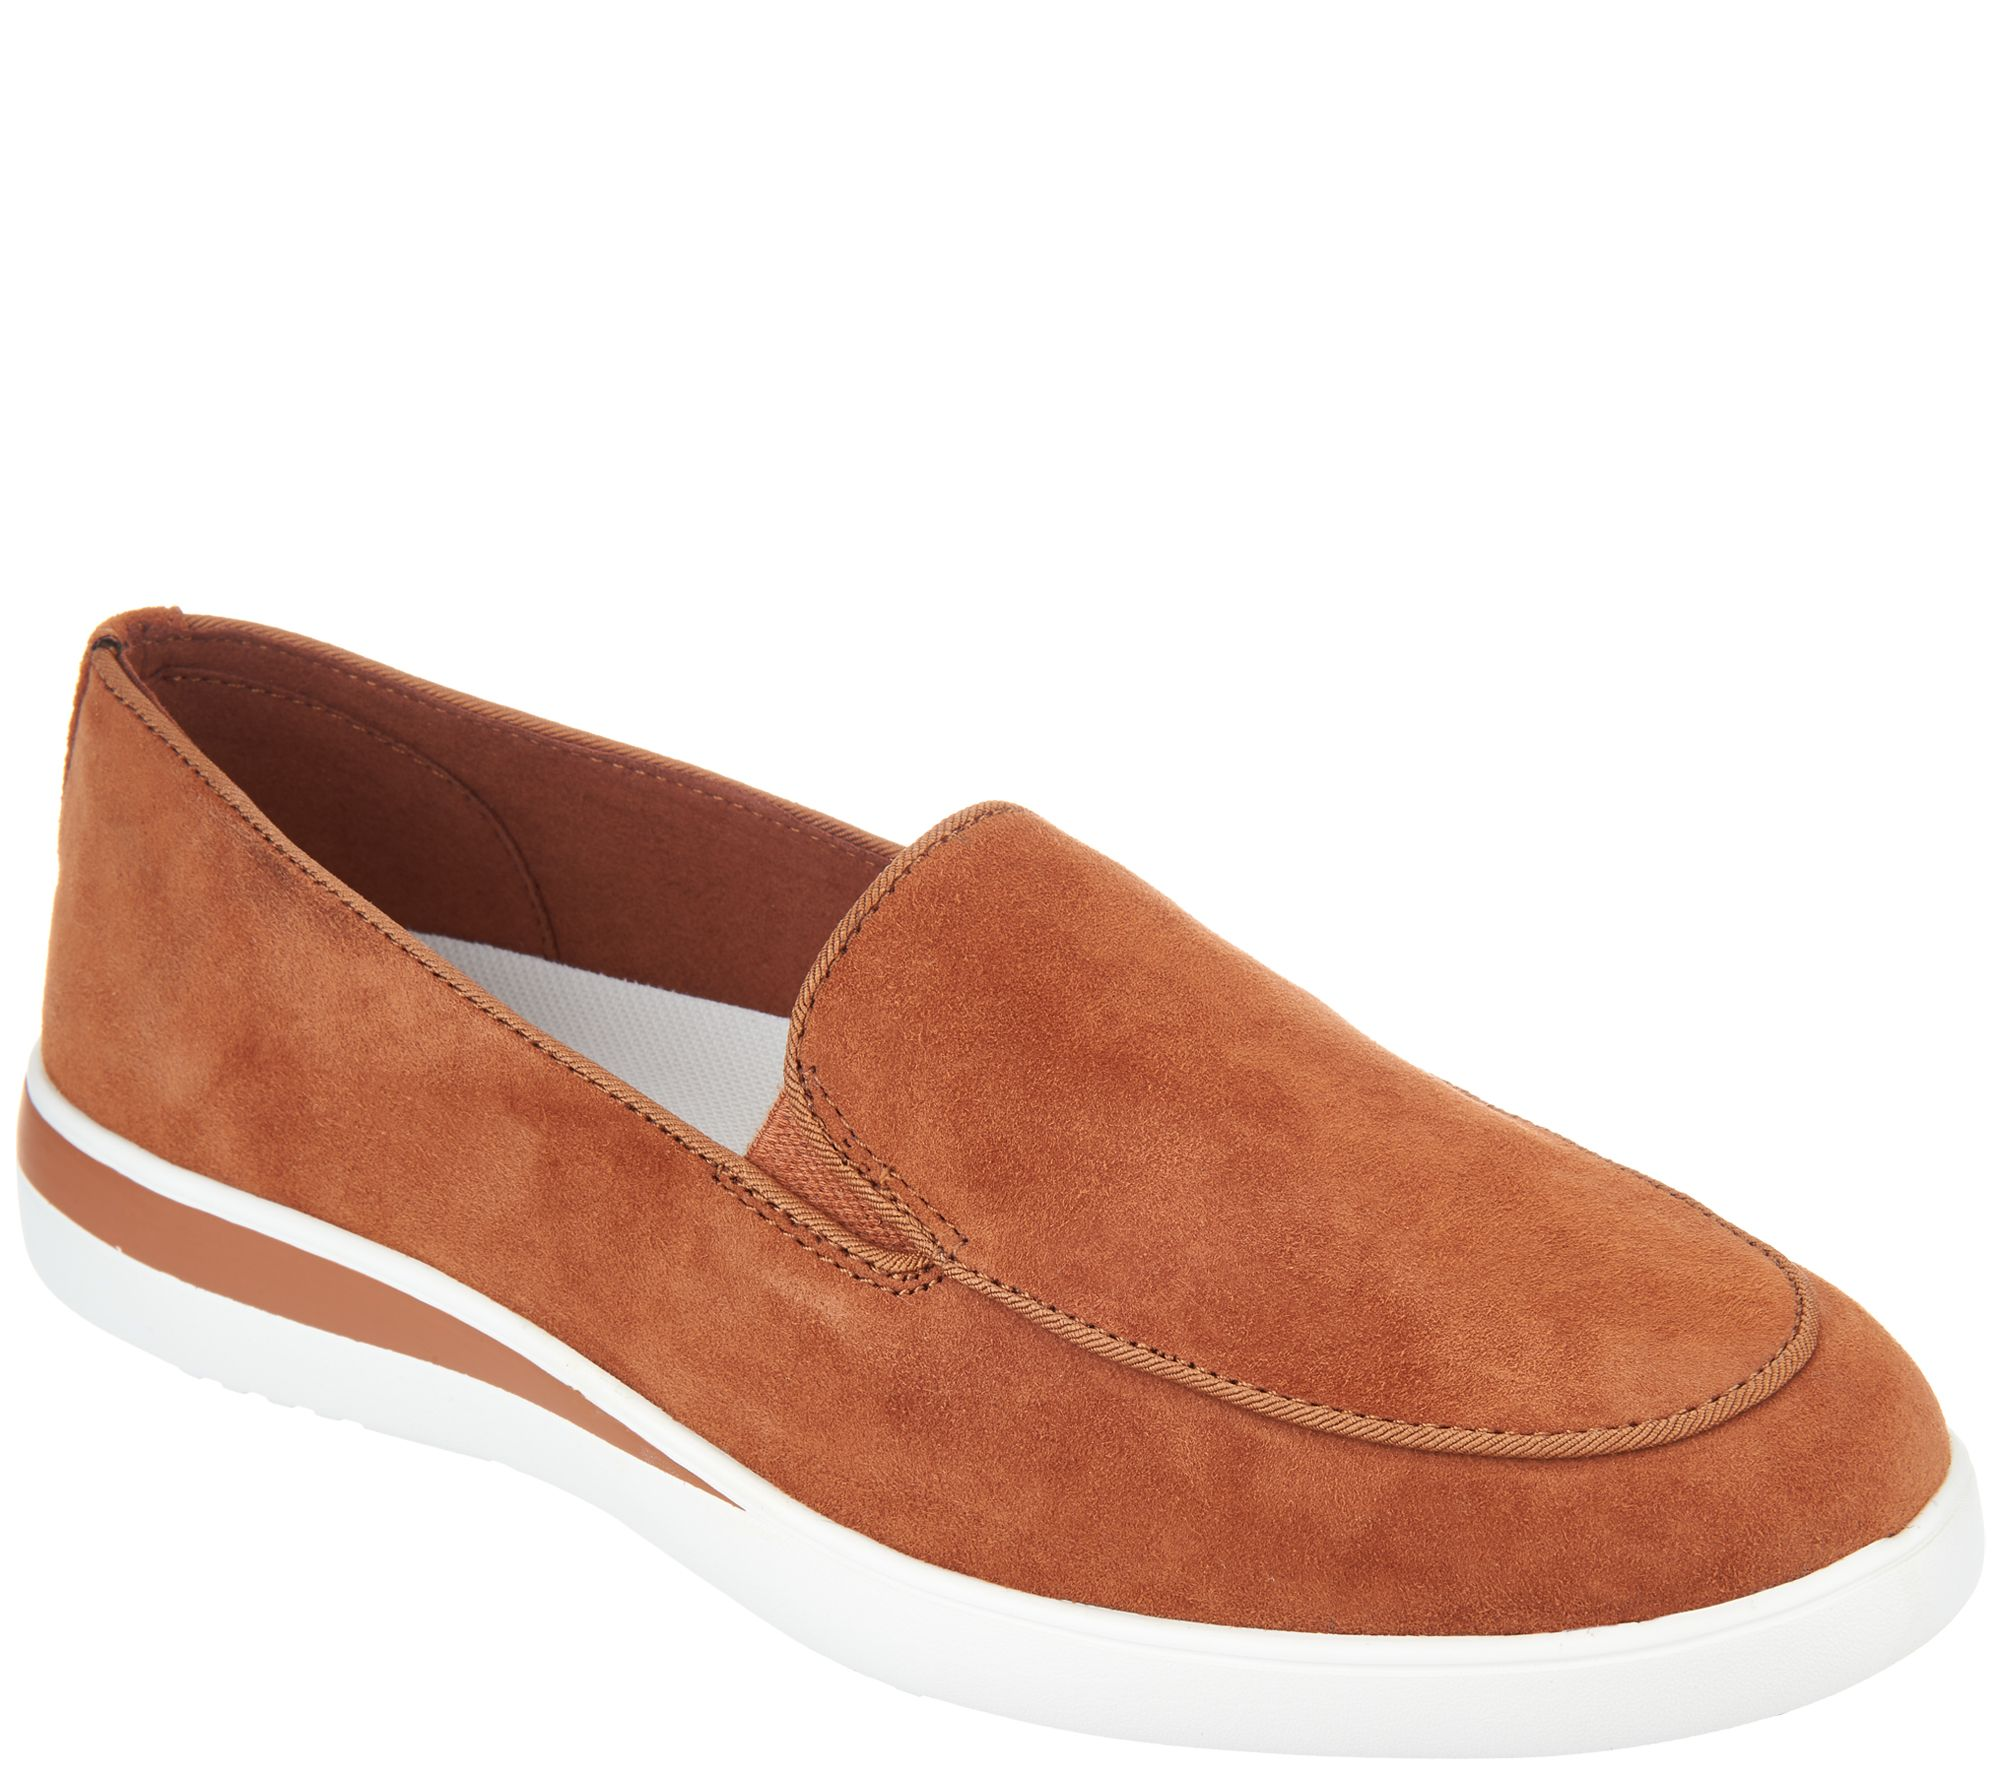 Ellen Degeneres Shoes Slip On Oxford